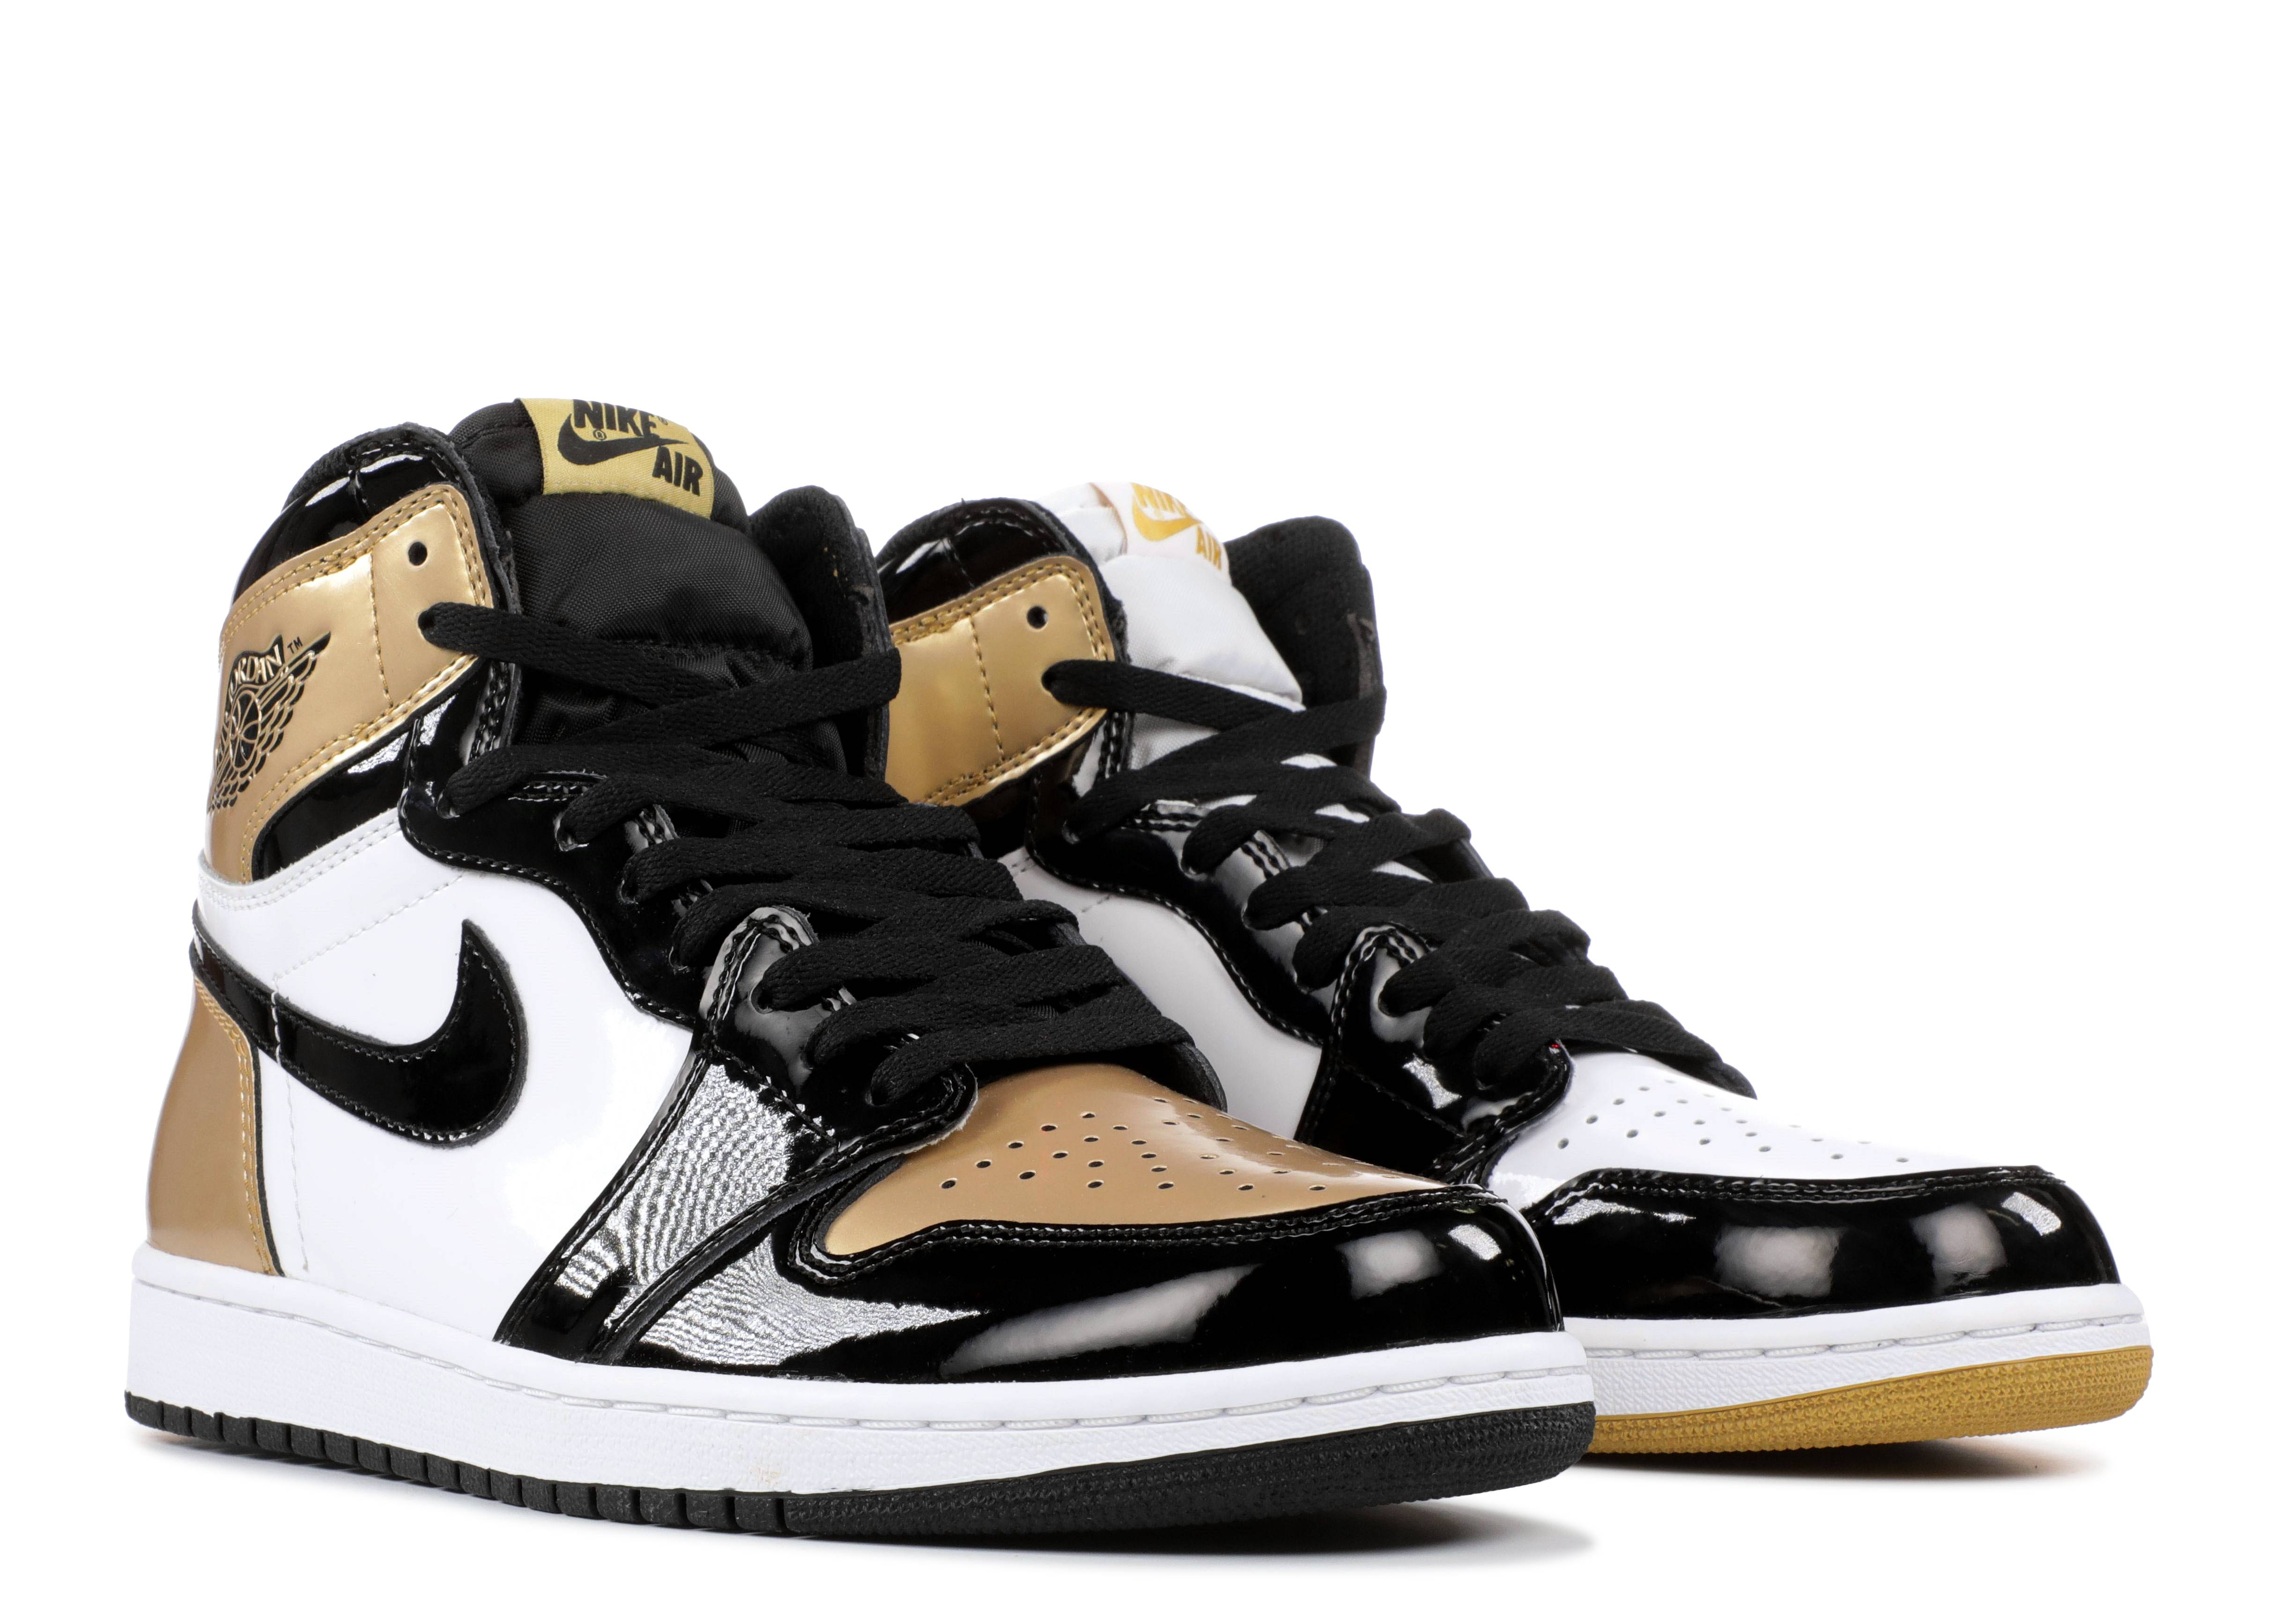 dc453f35bb Air Jordan 1 Retro High Og Nrg